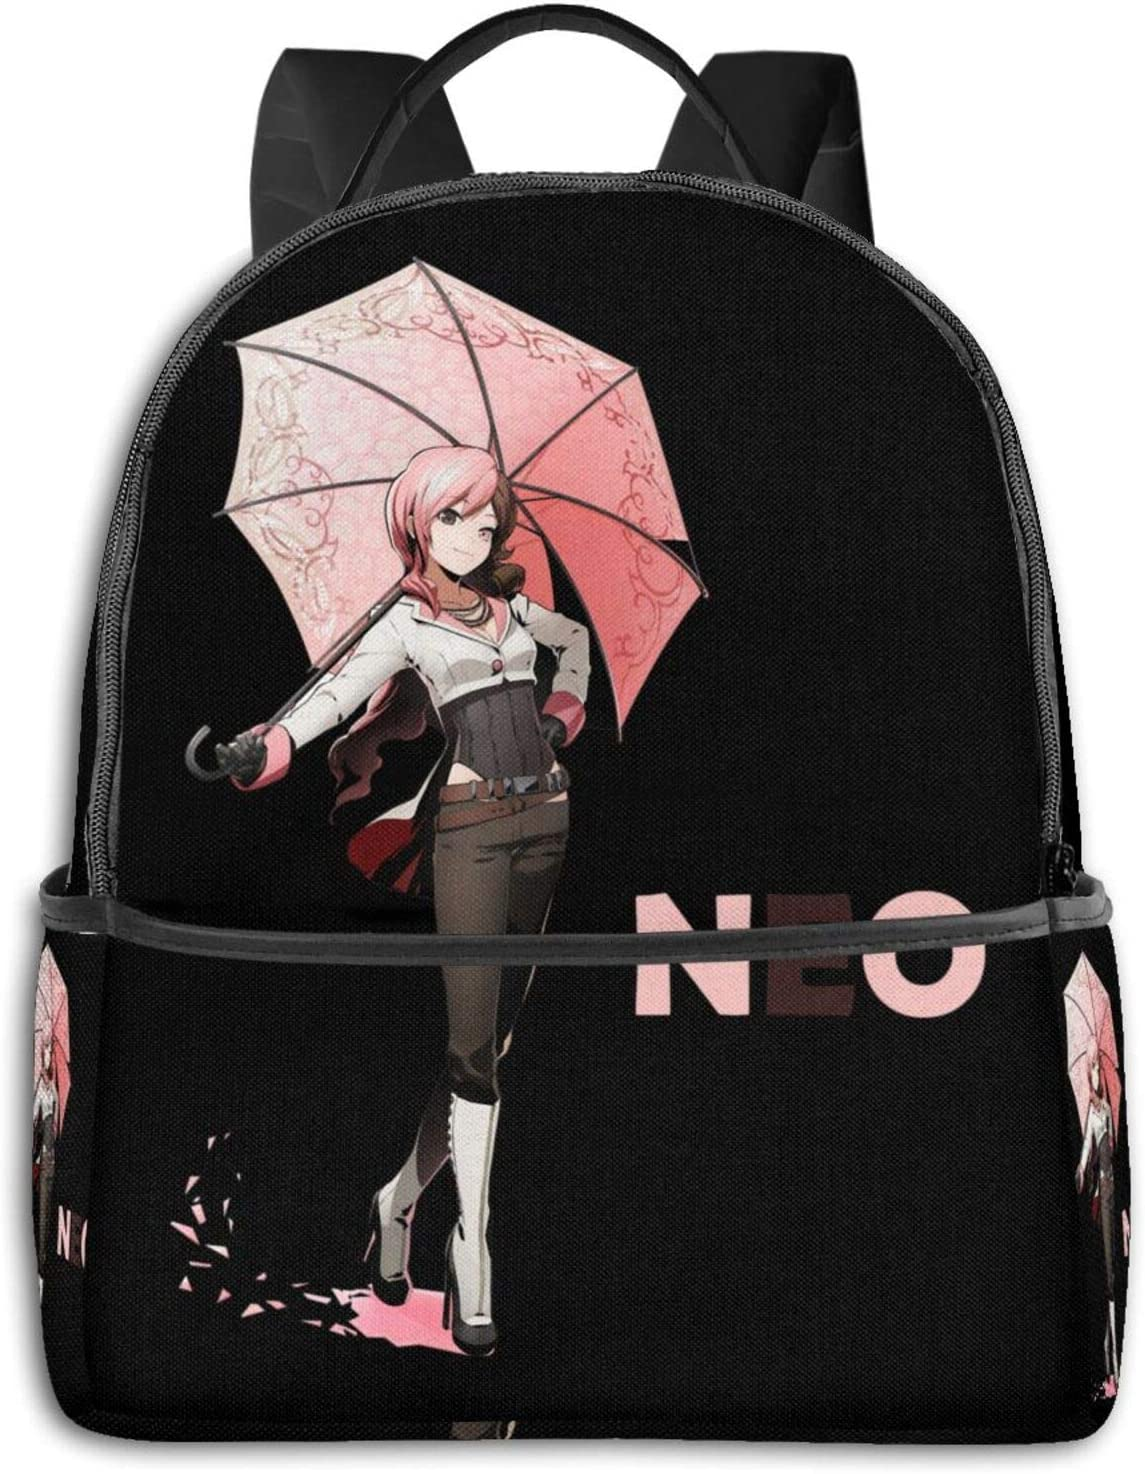 Anime Rwby Award-winning store - Neo Politan Student Cyc School Bag Classic Popular product